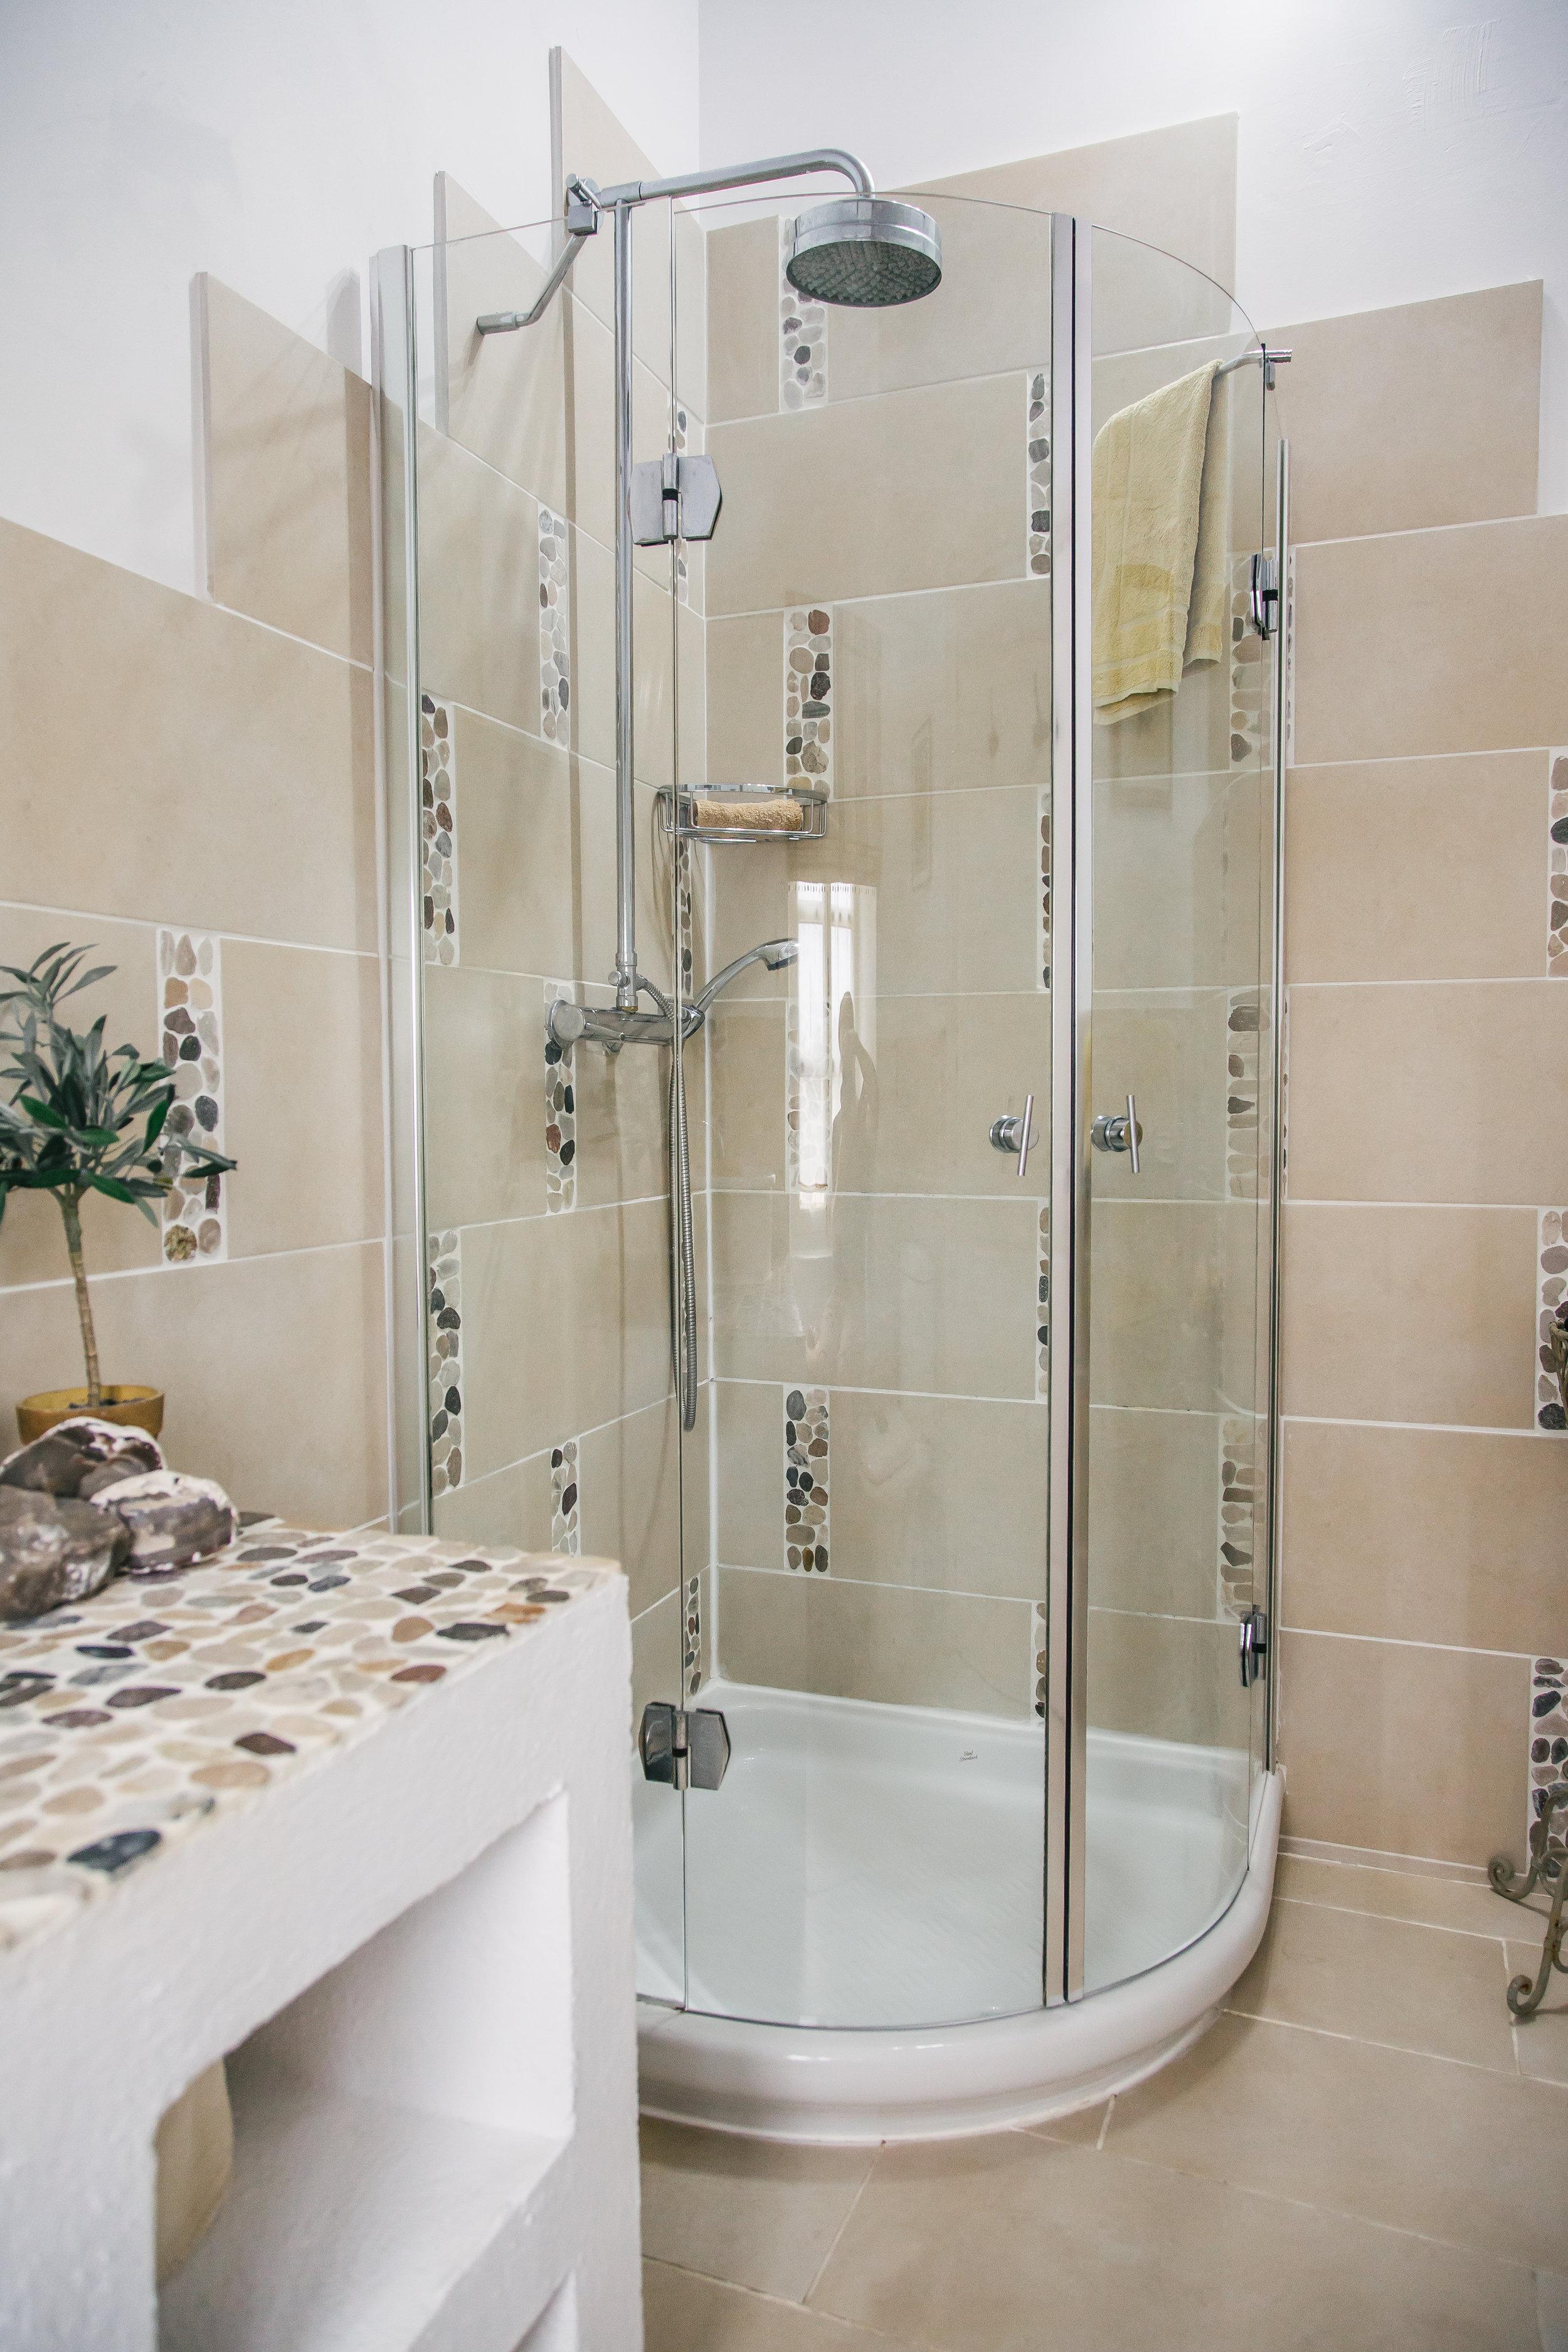 The Athena Room Bathroom